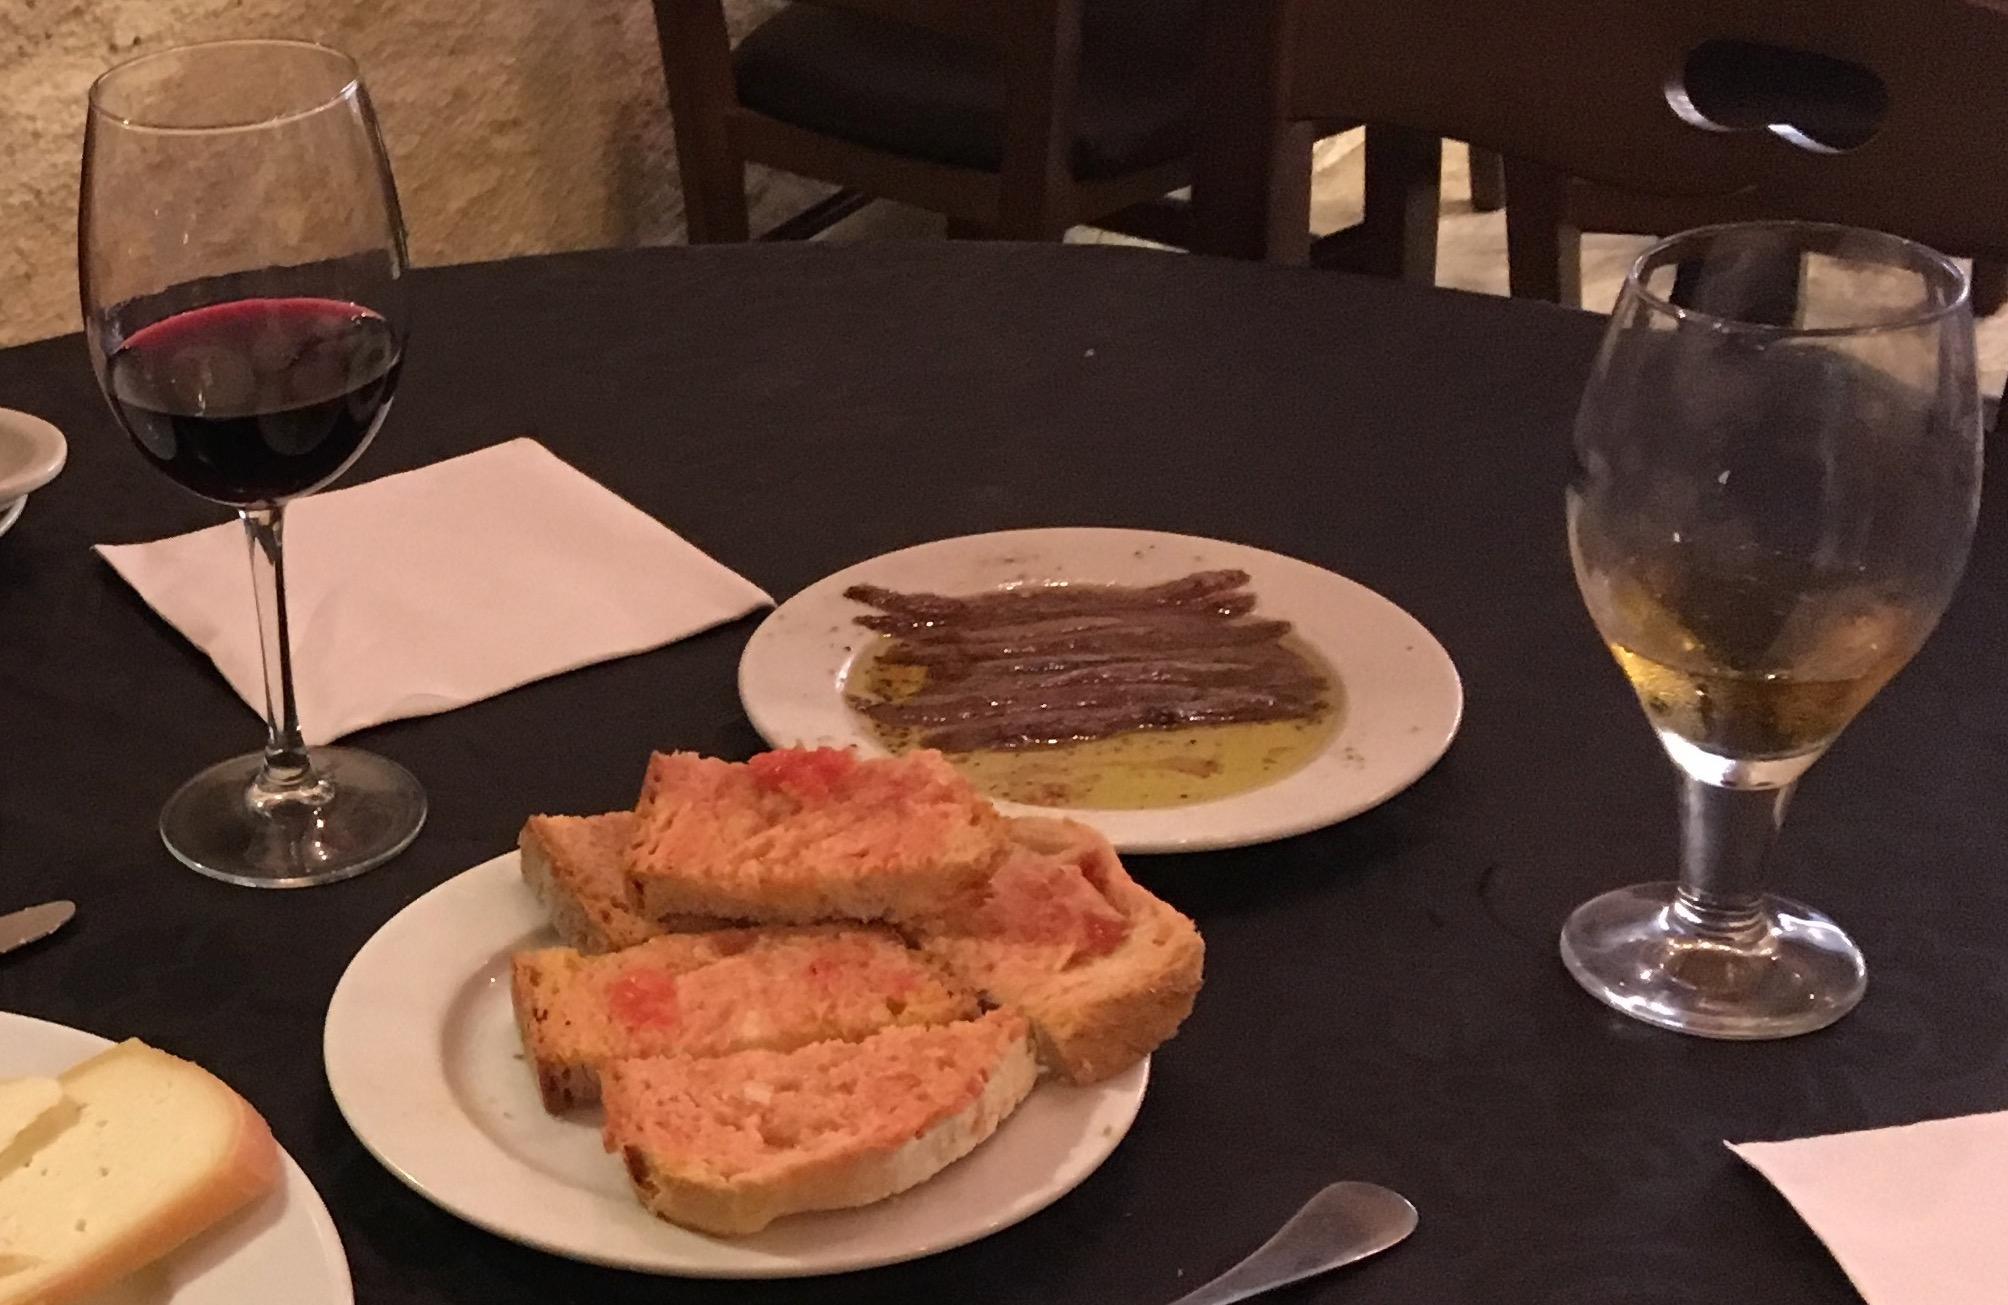 Pa amb tomàquet - Bread and tomato